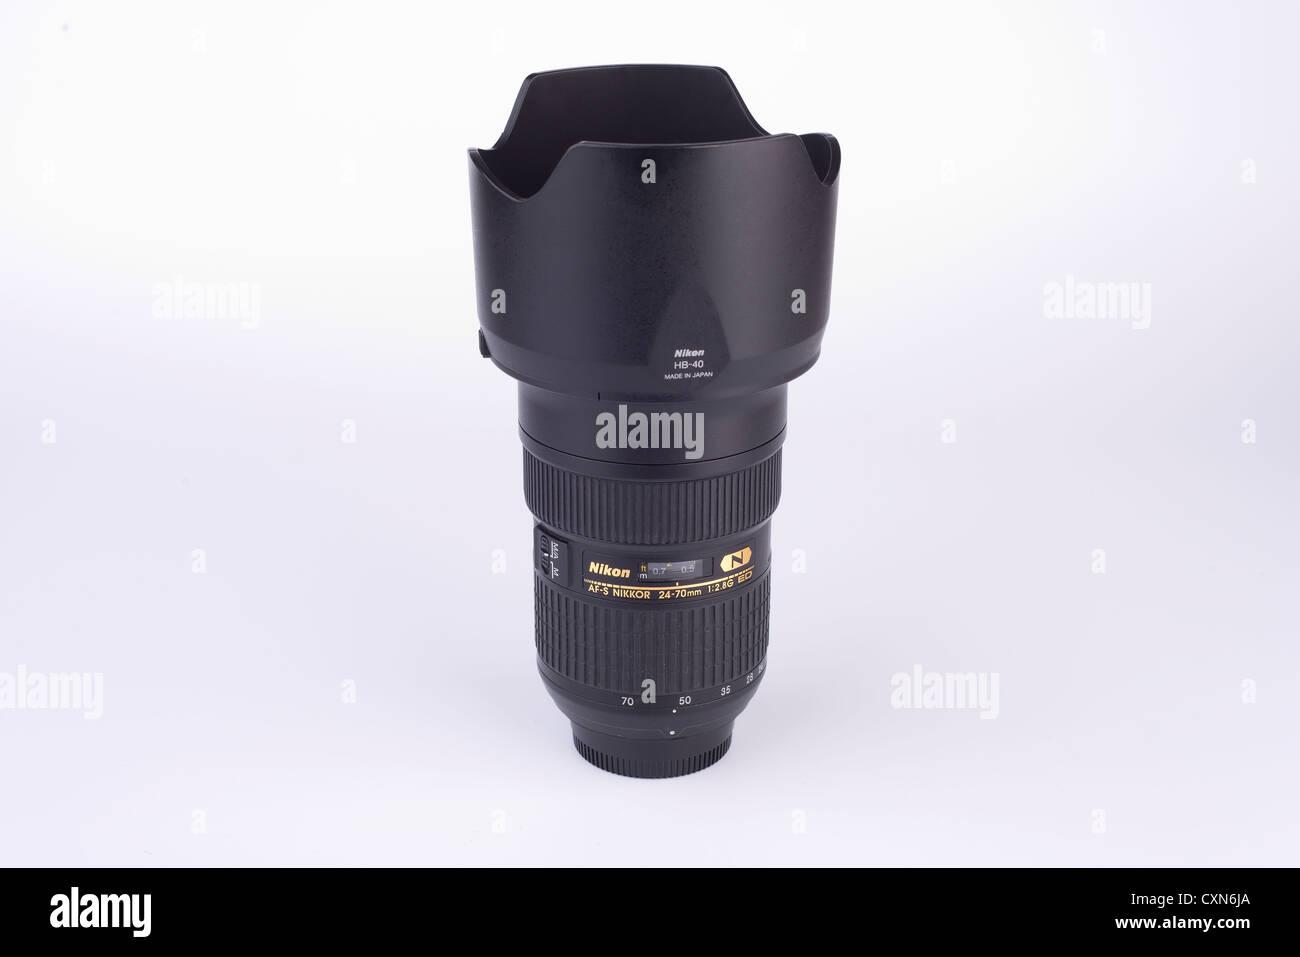 24-70 Nikon lens - Stock Image